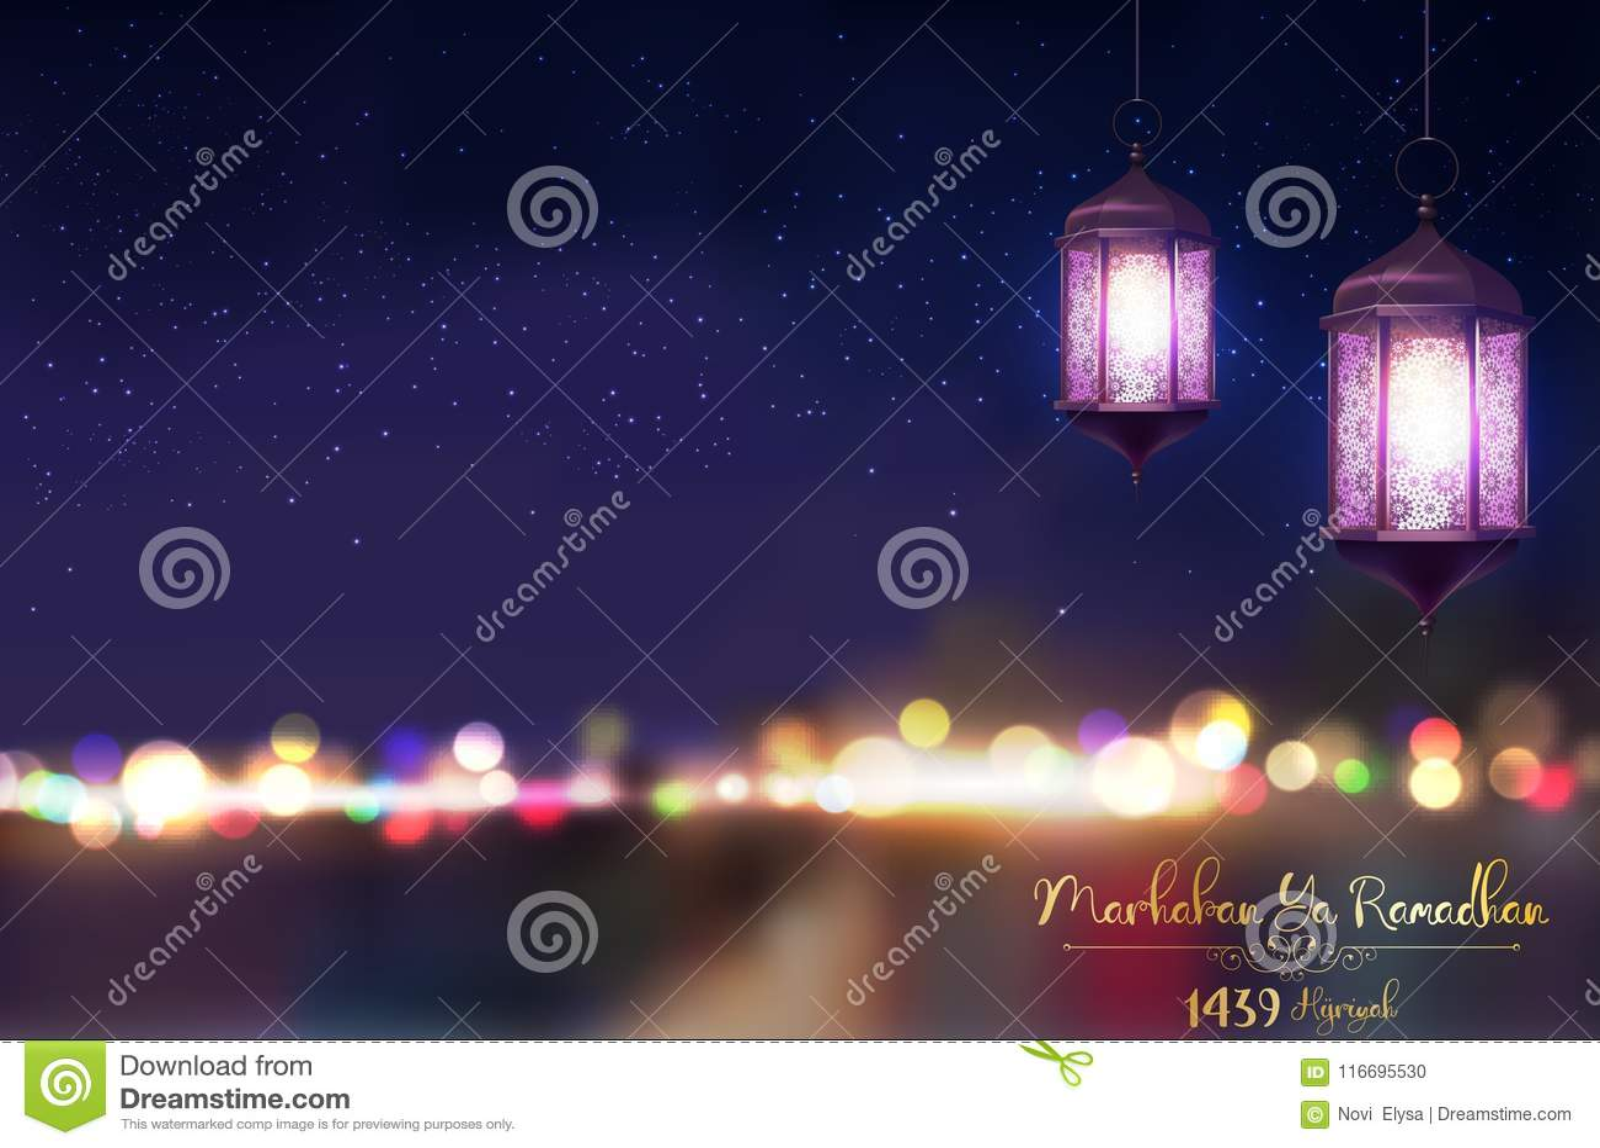 Ya de Marhaban ramadhan Saludo de Ramadan Kareem en fondo borroso con la linterna árabe iluminada hermosa